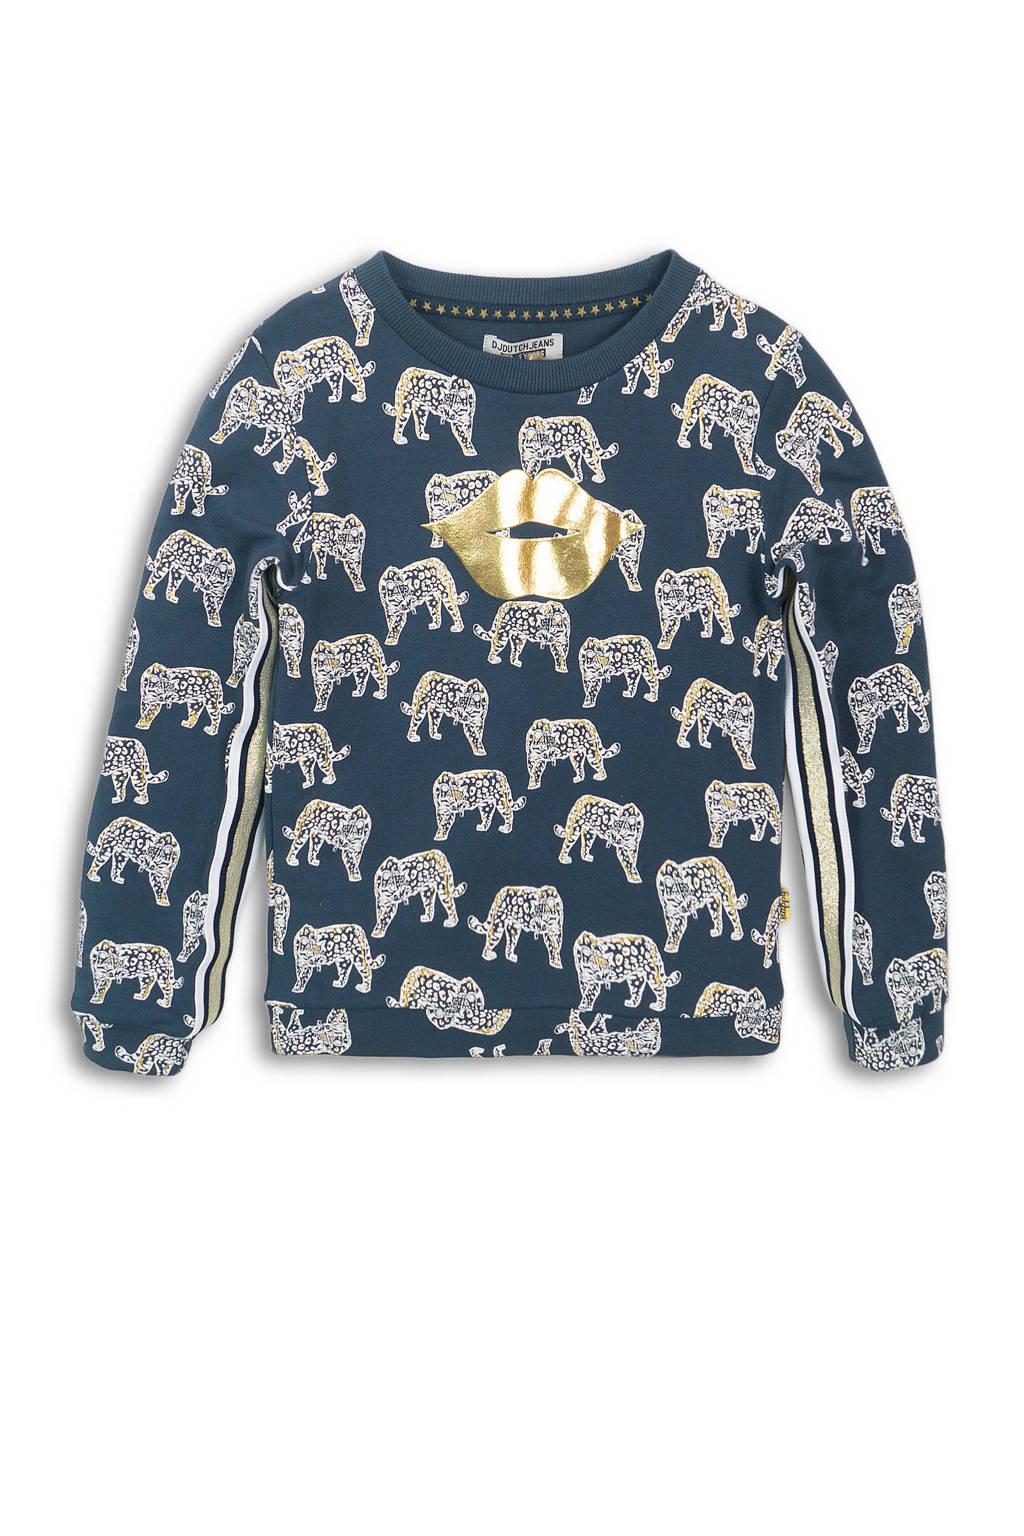 DJ Dutchjeans sweater met contrastbies donkerblauw/wit/goud